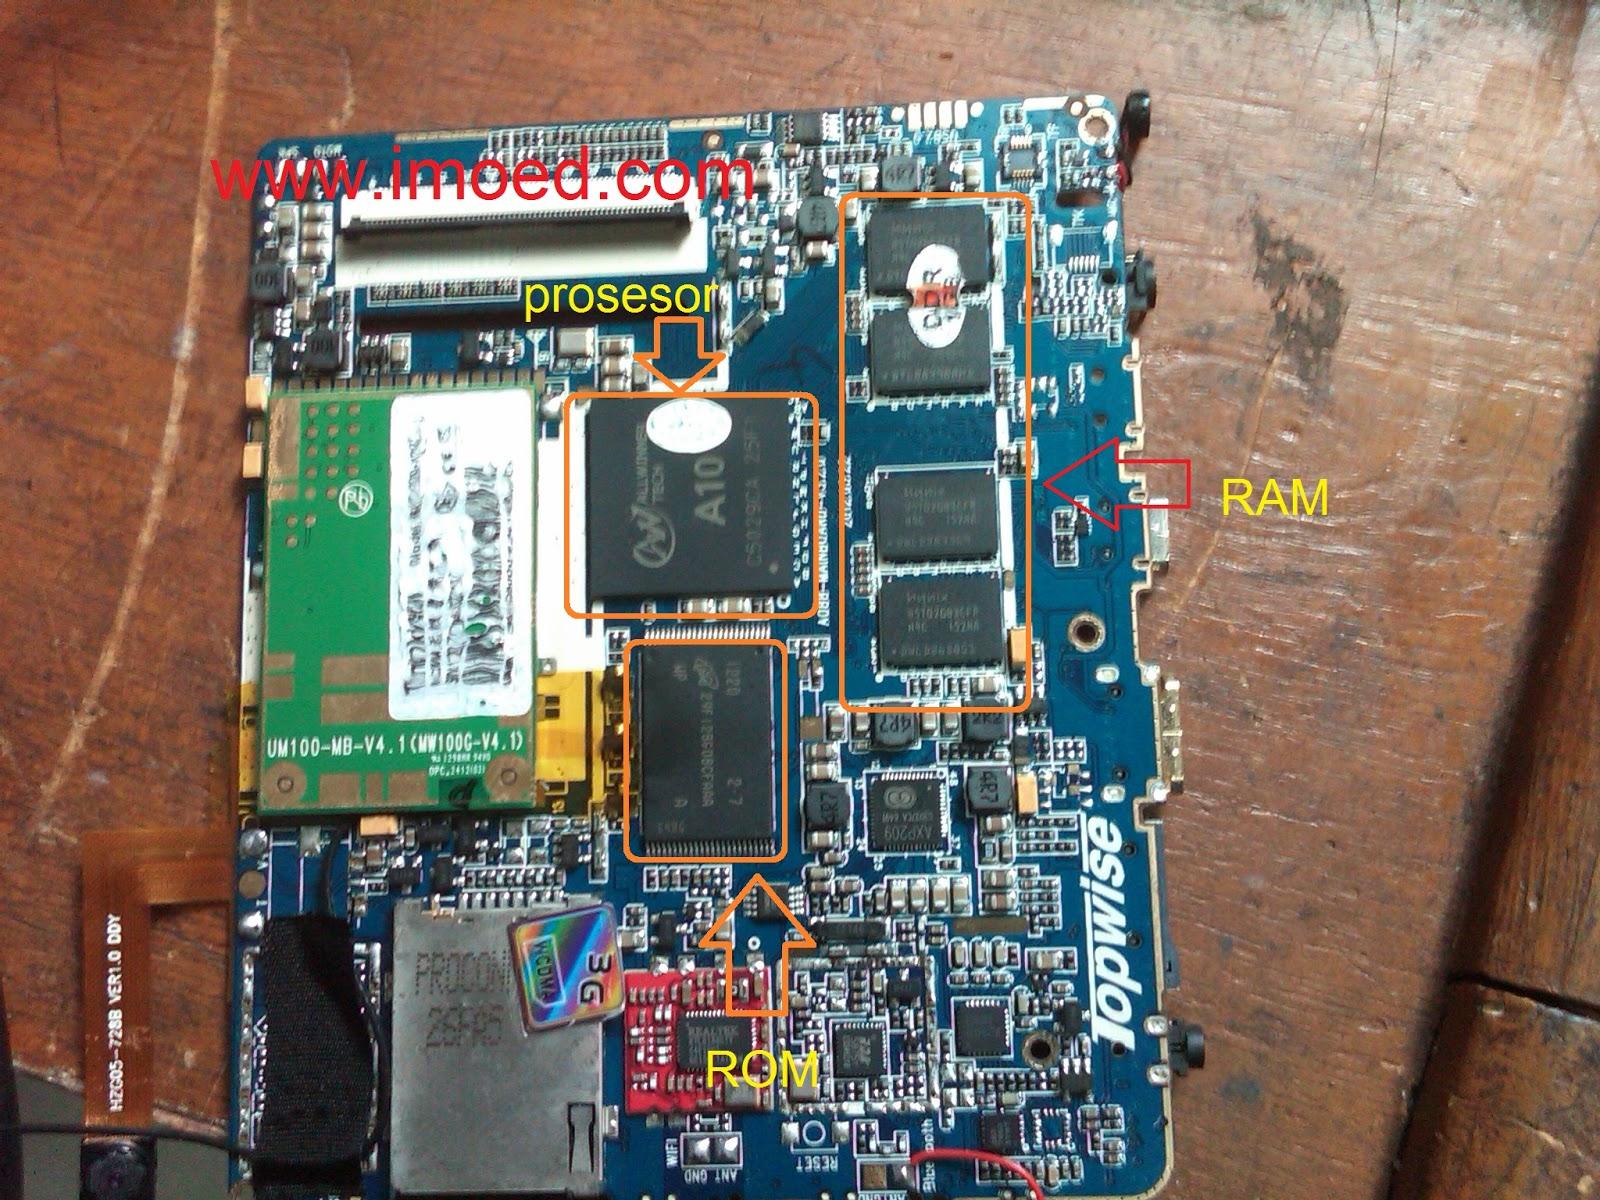 PCB mesin tablet treq A10G duo, terdiri dari satu buah ic prosesor A10